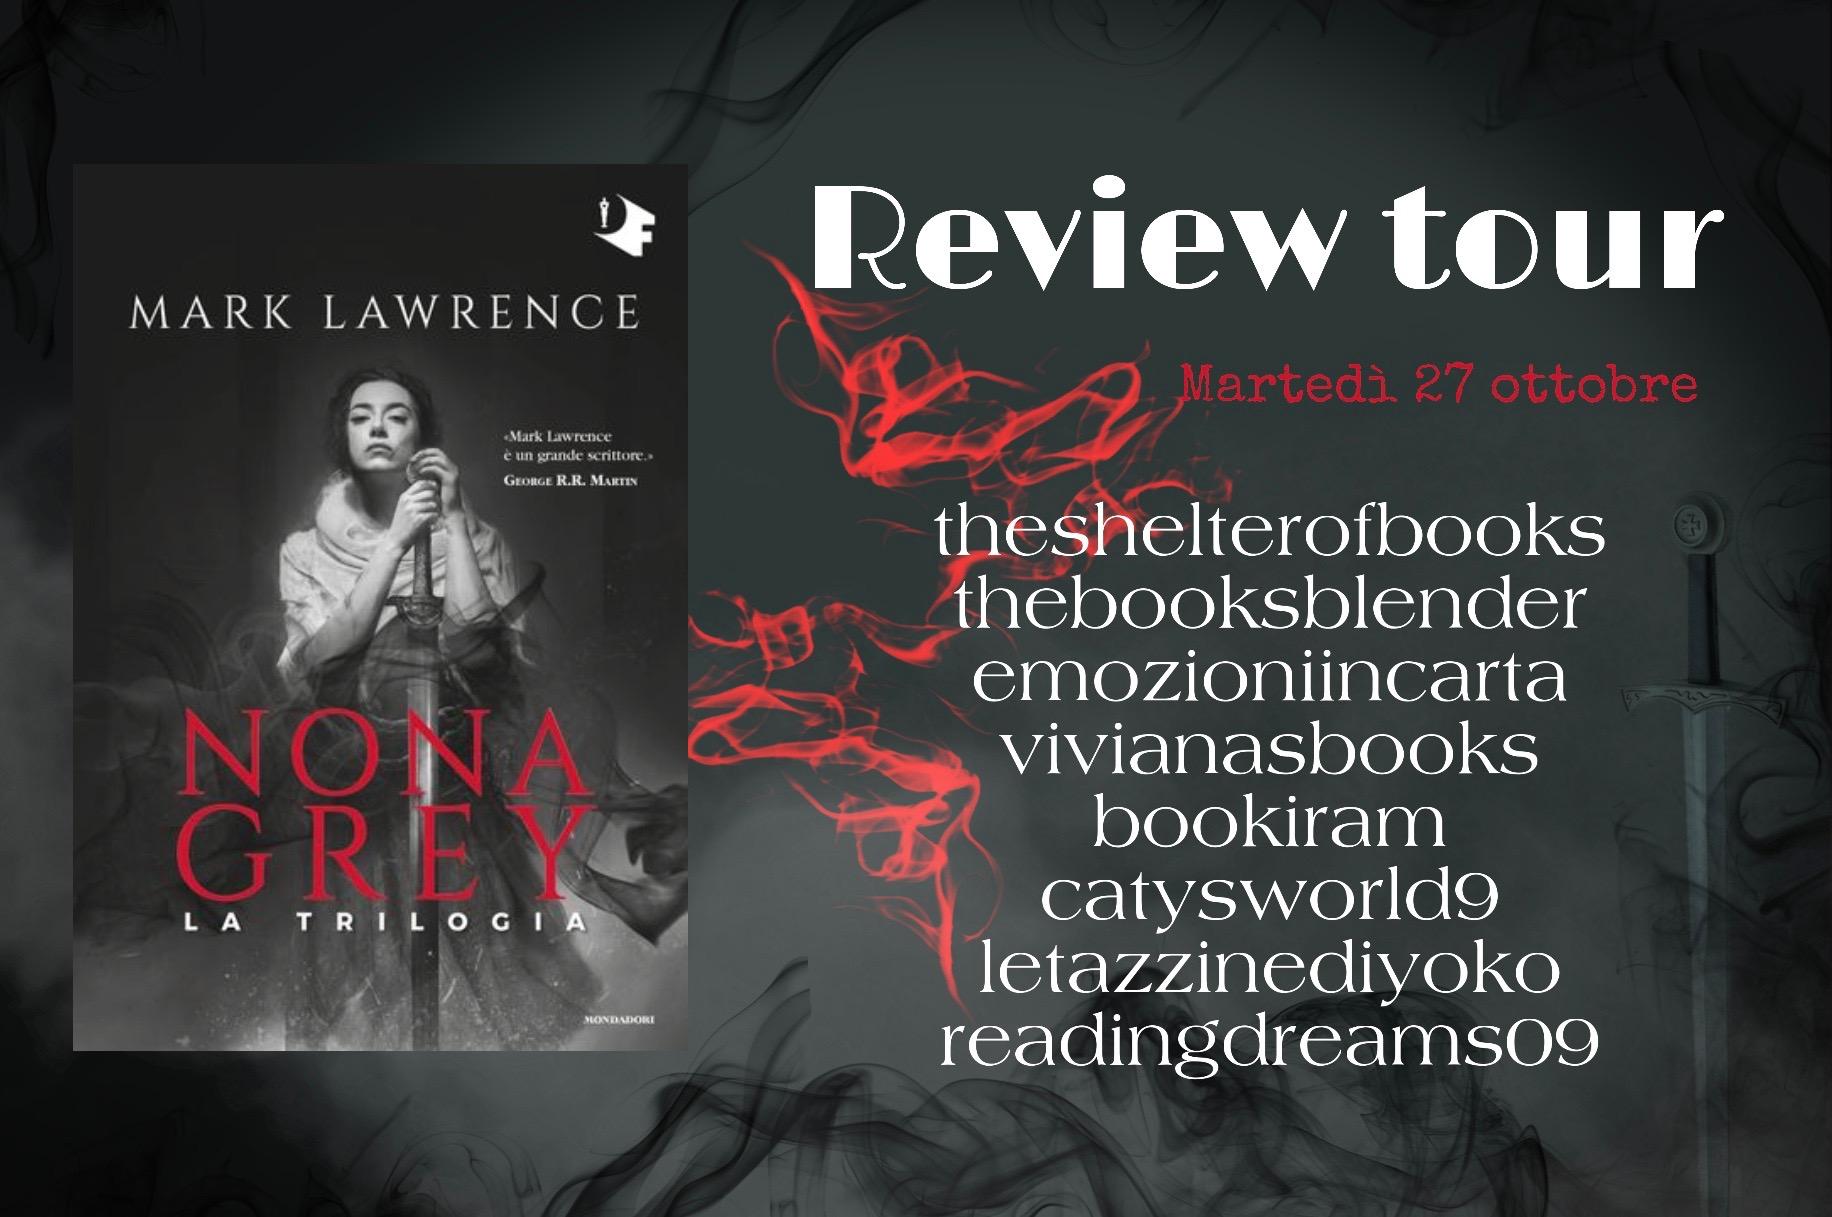 Review Tour: Nona Grey – La trilogia